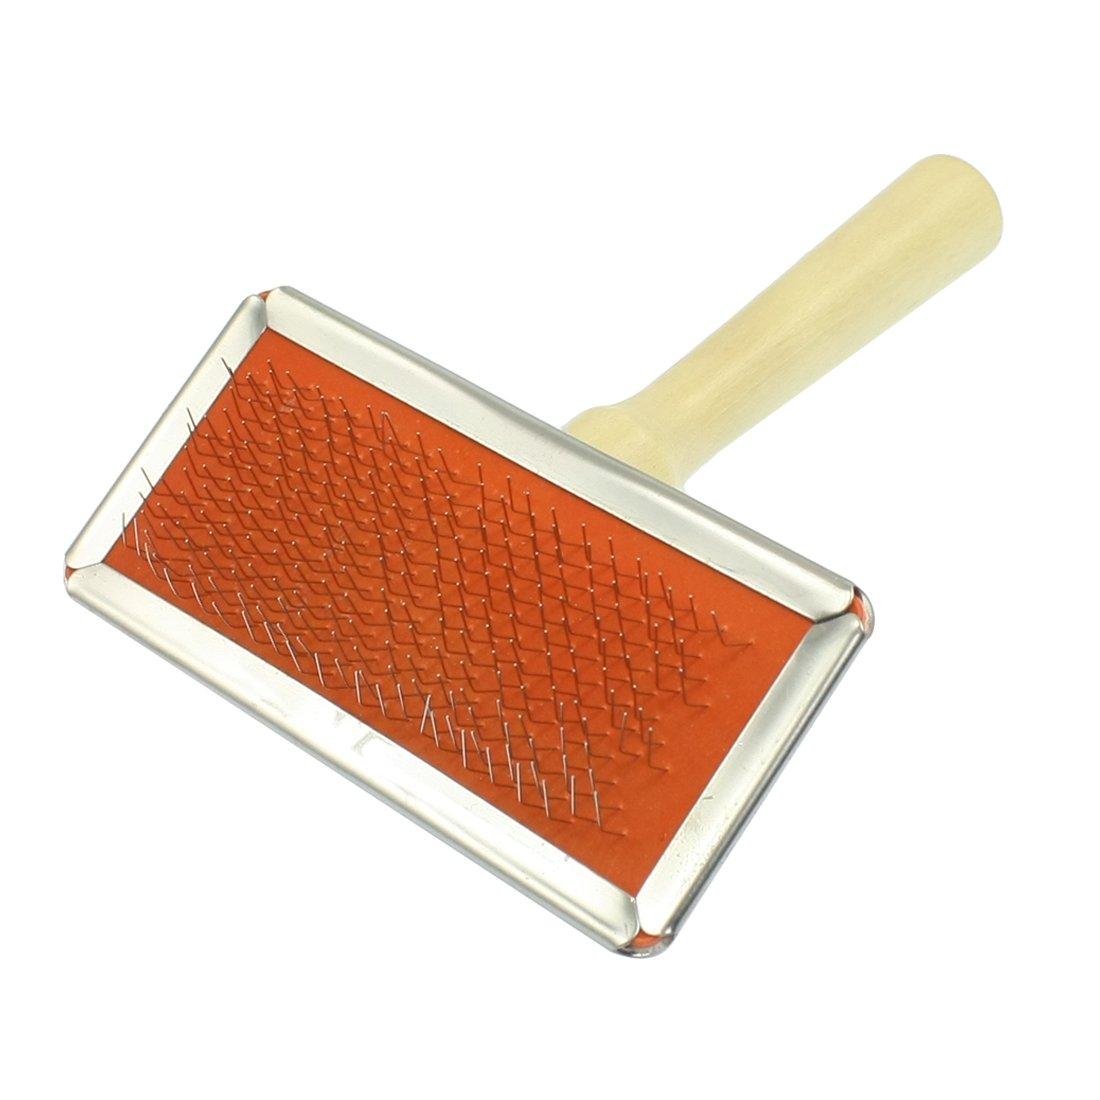 Jardin Wooden Handle Pet Shedding Tool Grooming Hair Brush Comb